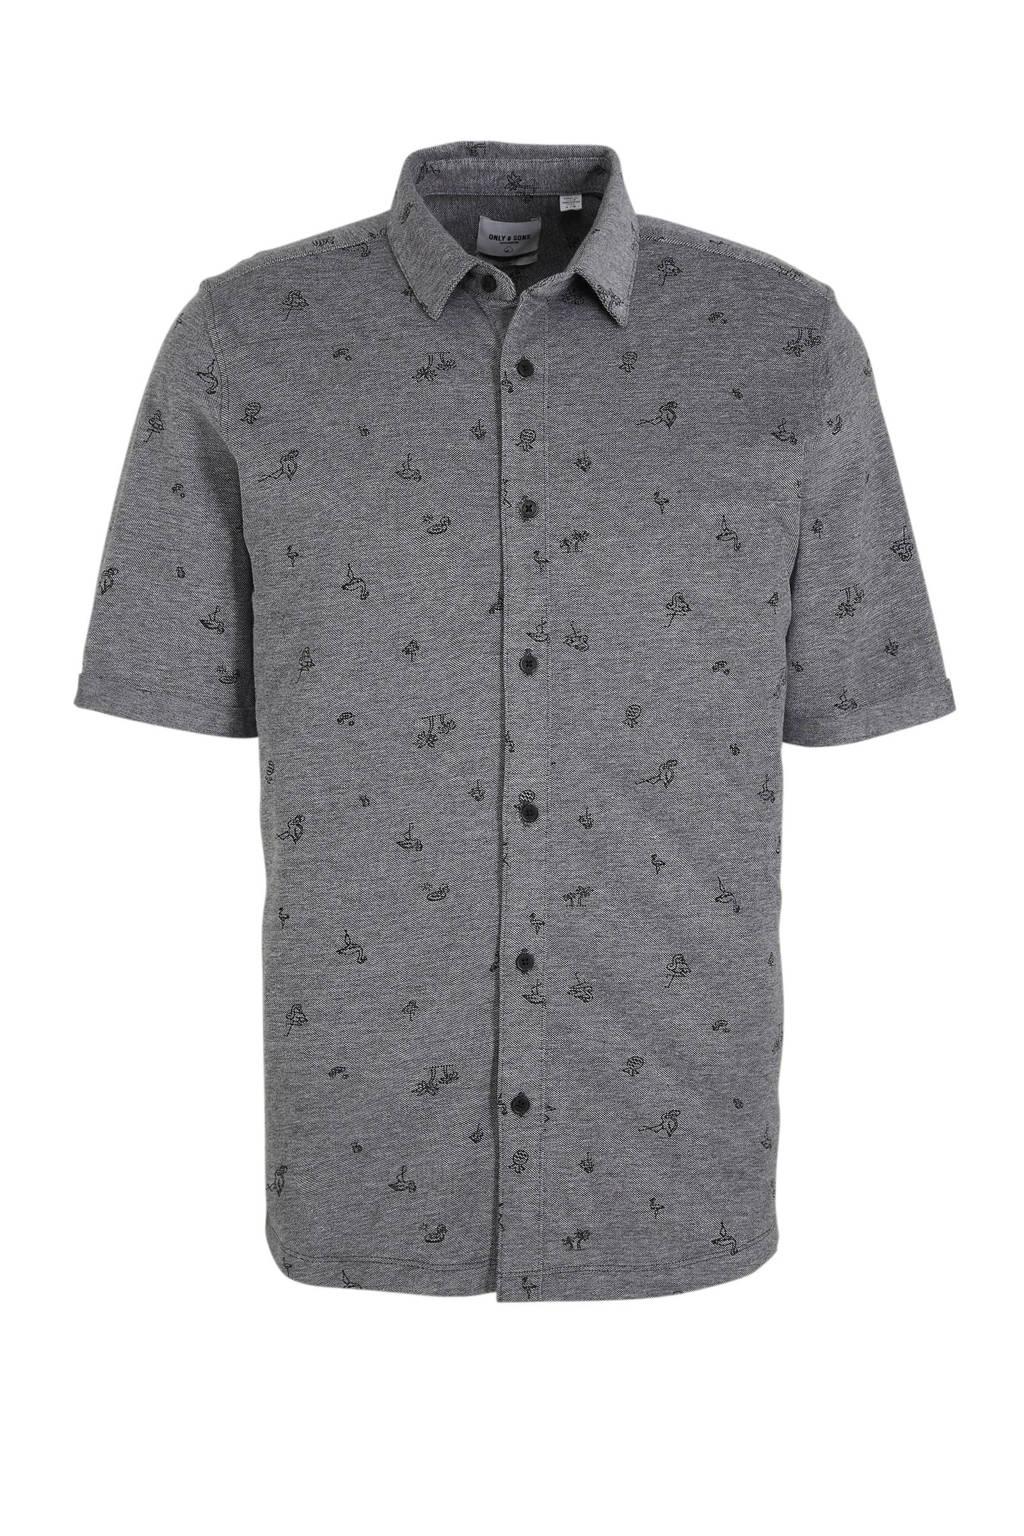 ONLY & SONS slim fit overhemd met all over print black, Black